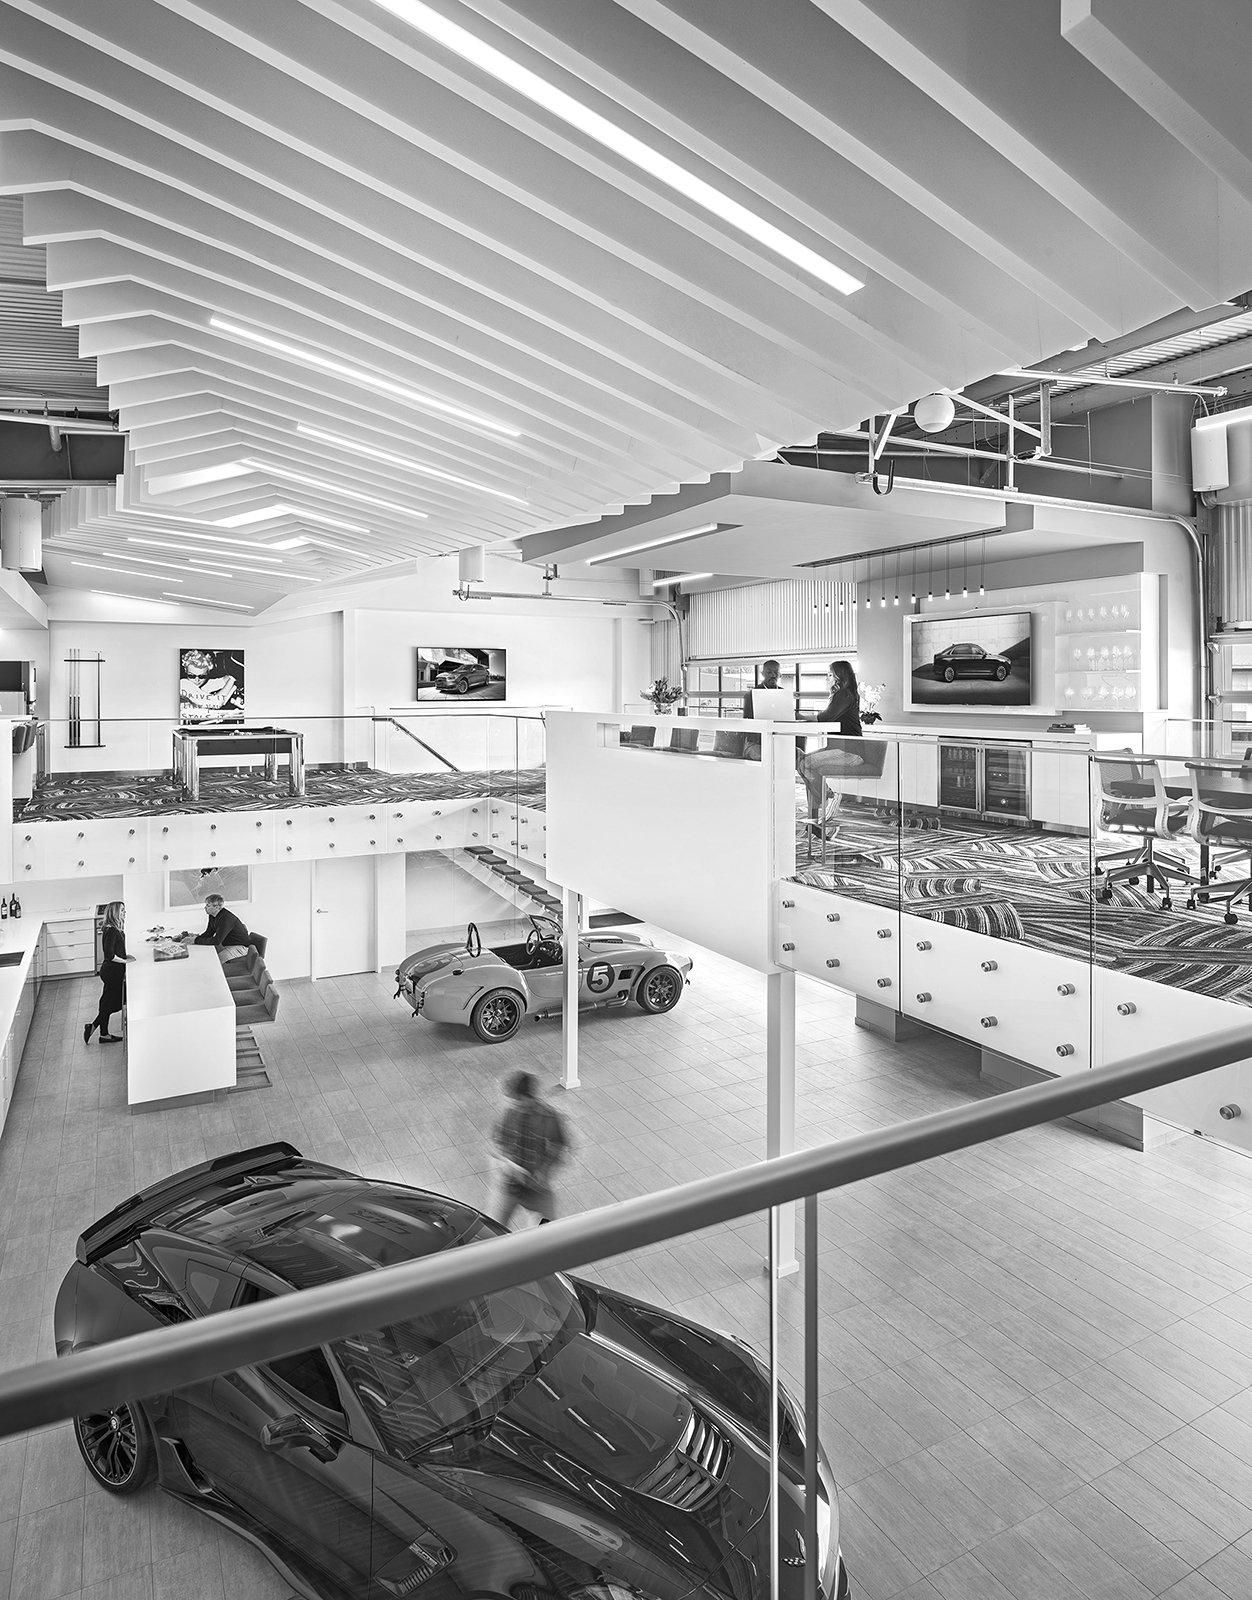 Interior of M1 Concourse Car Condos Project in Pontiac Michigan Architecture Black and White